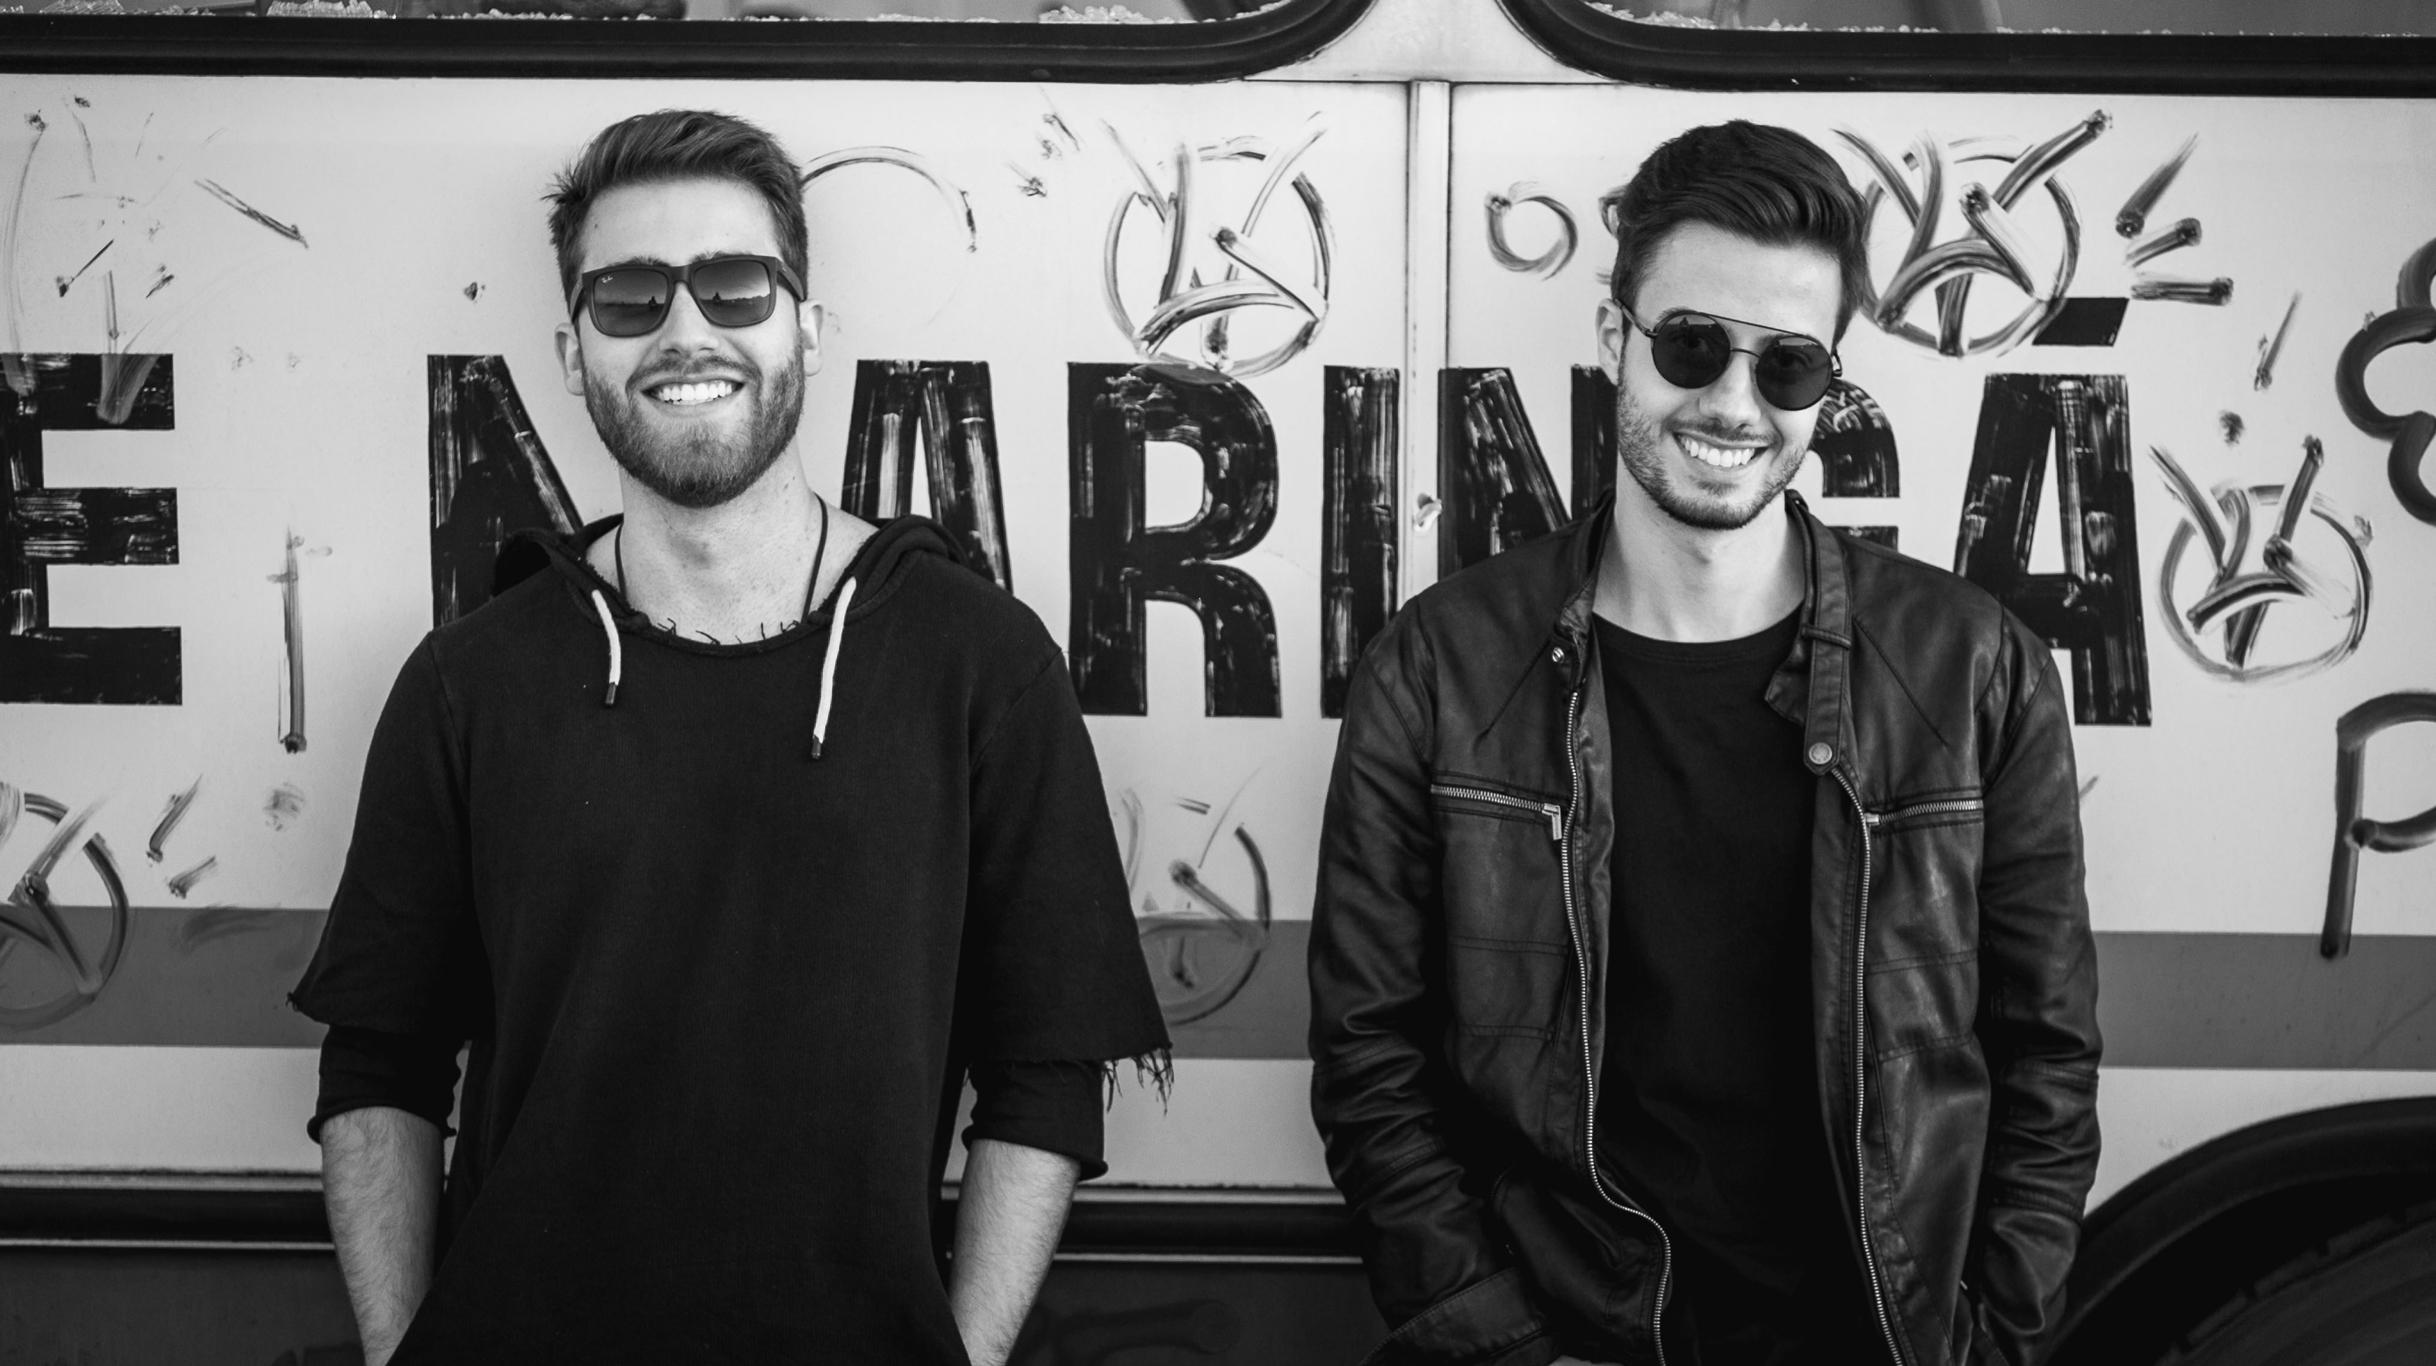 entrevista duo djs inndrive